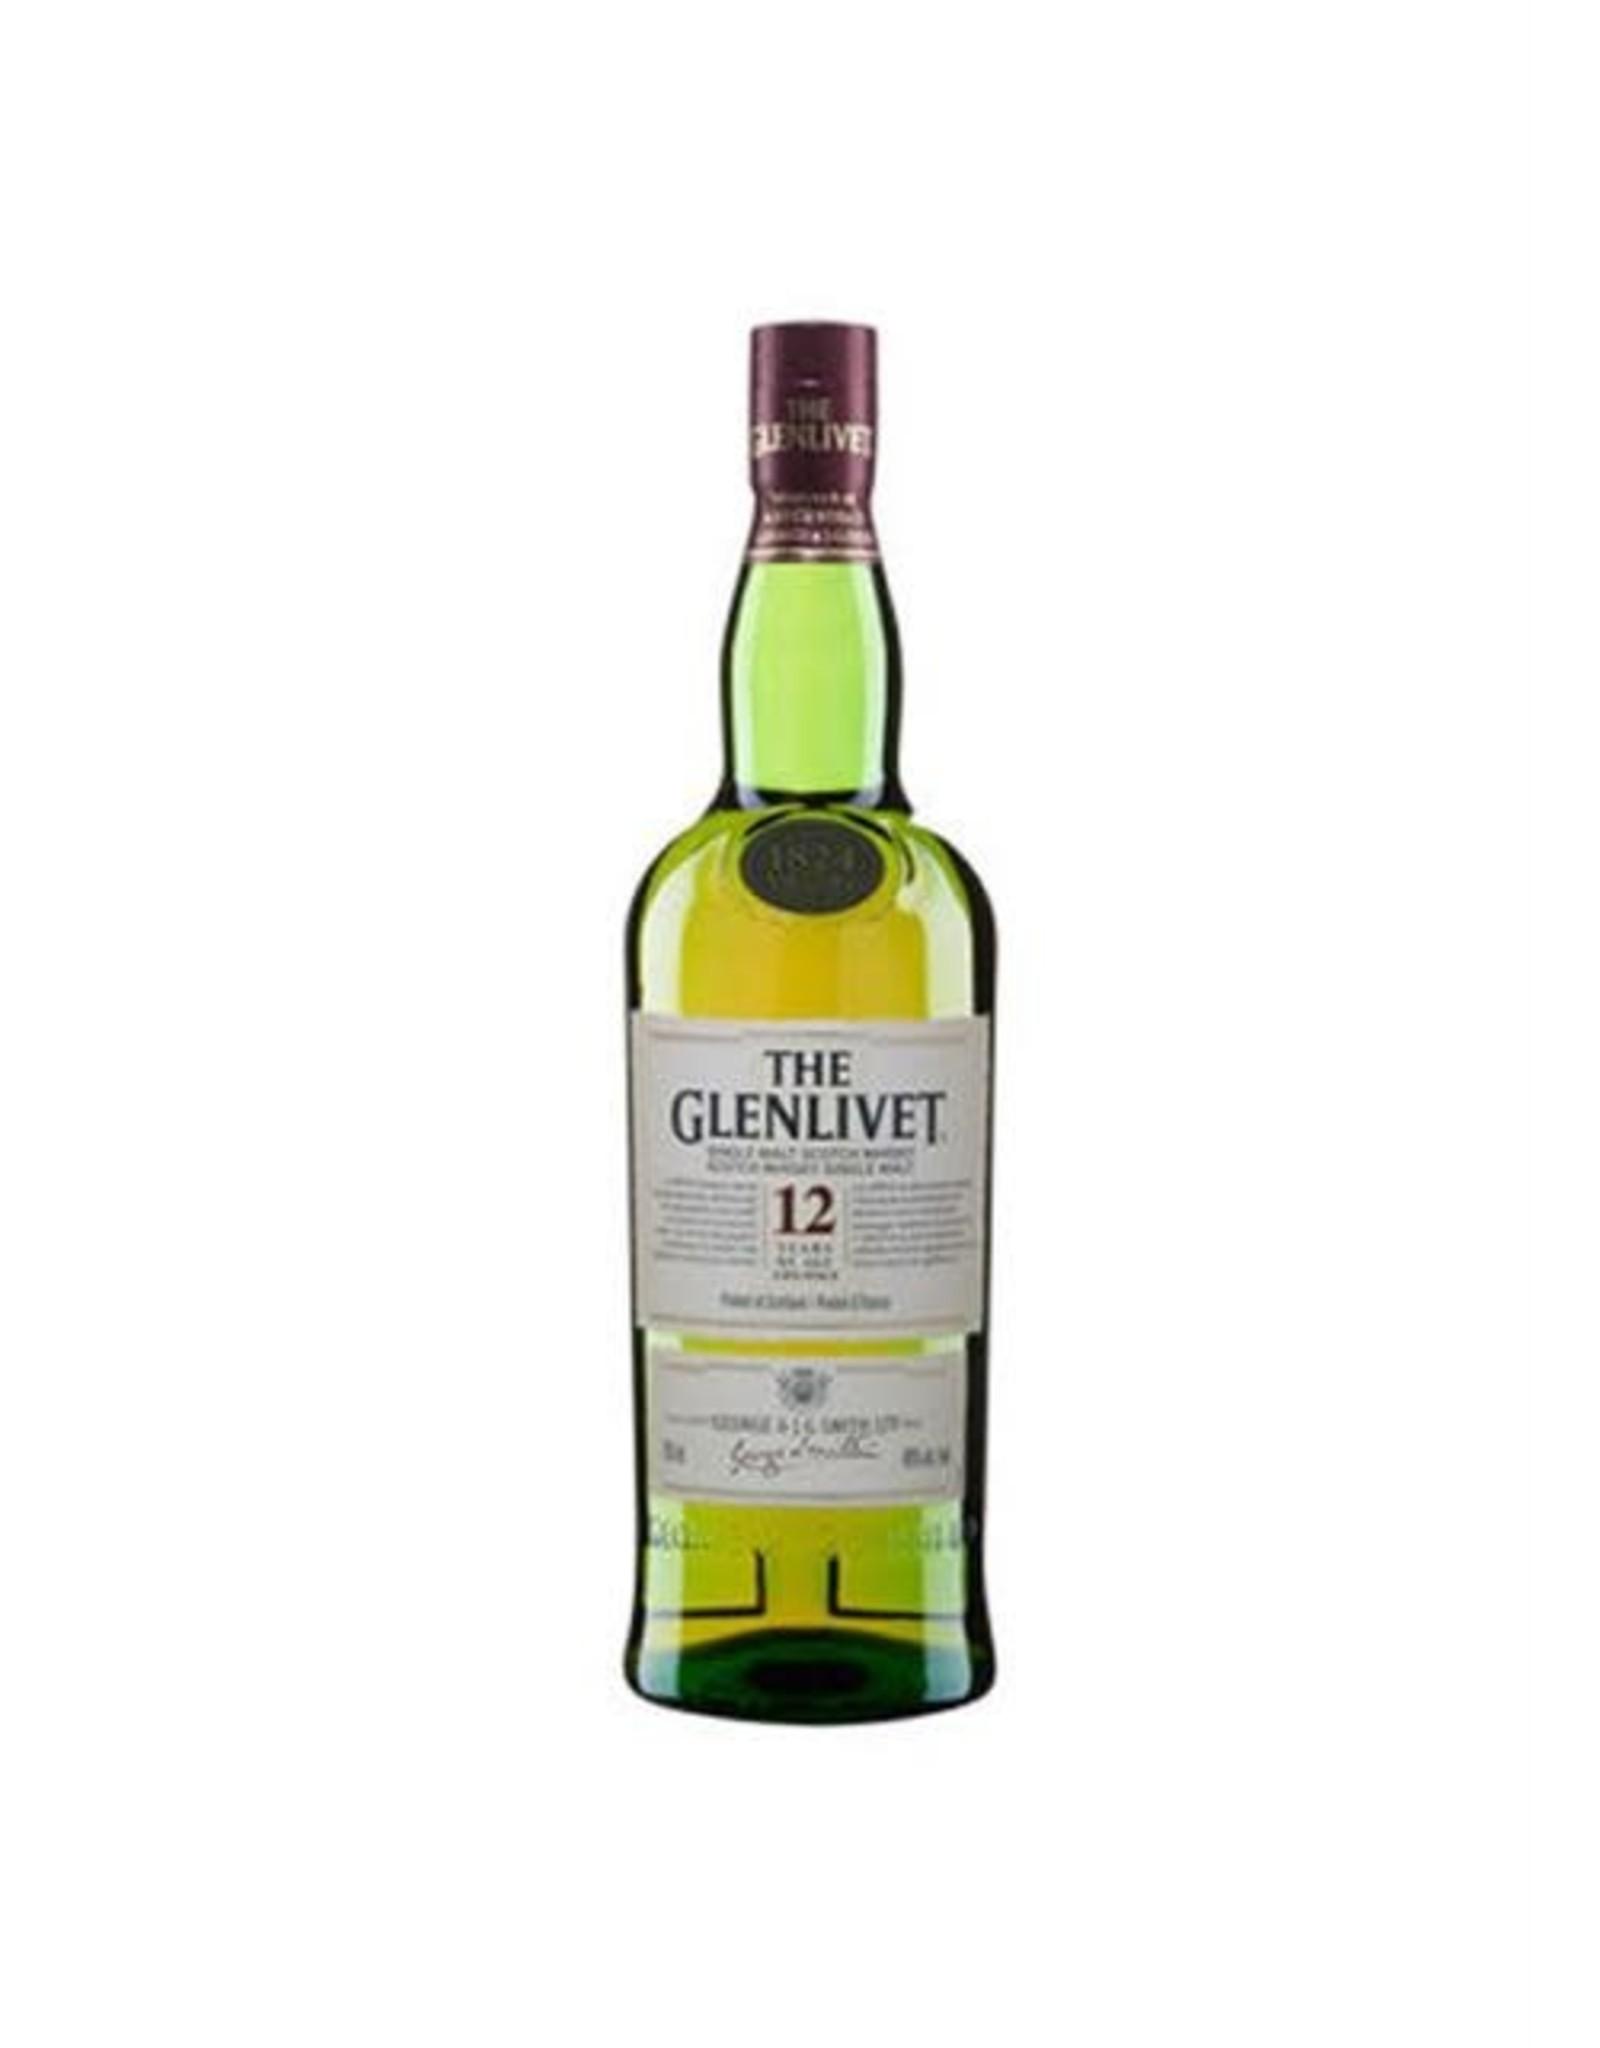 GLENLIVET 12YR SCOTCH 375ML